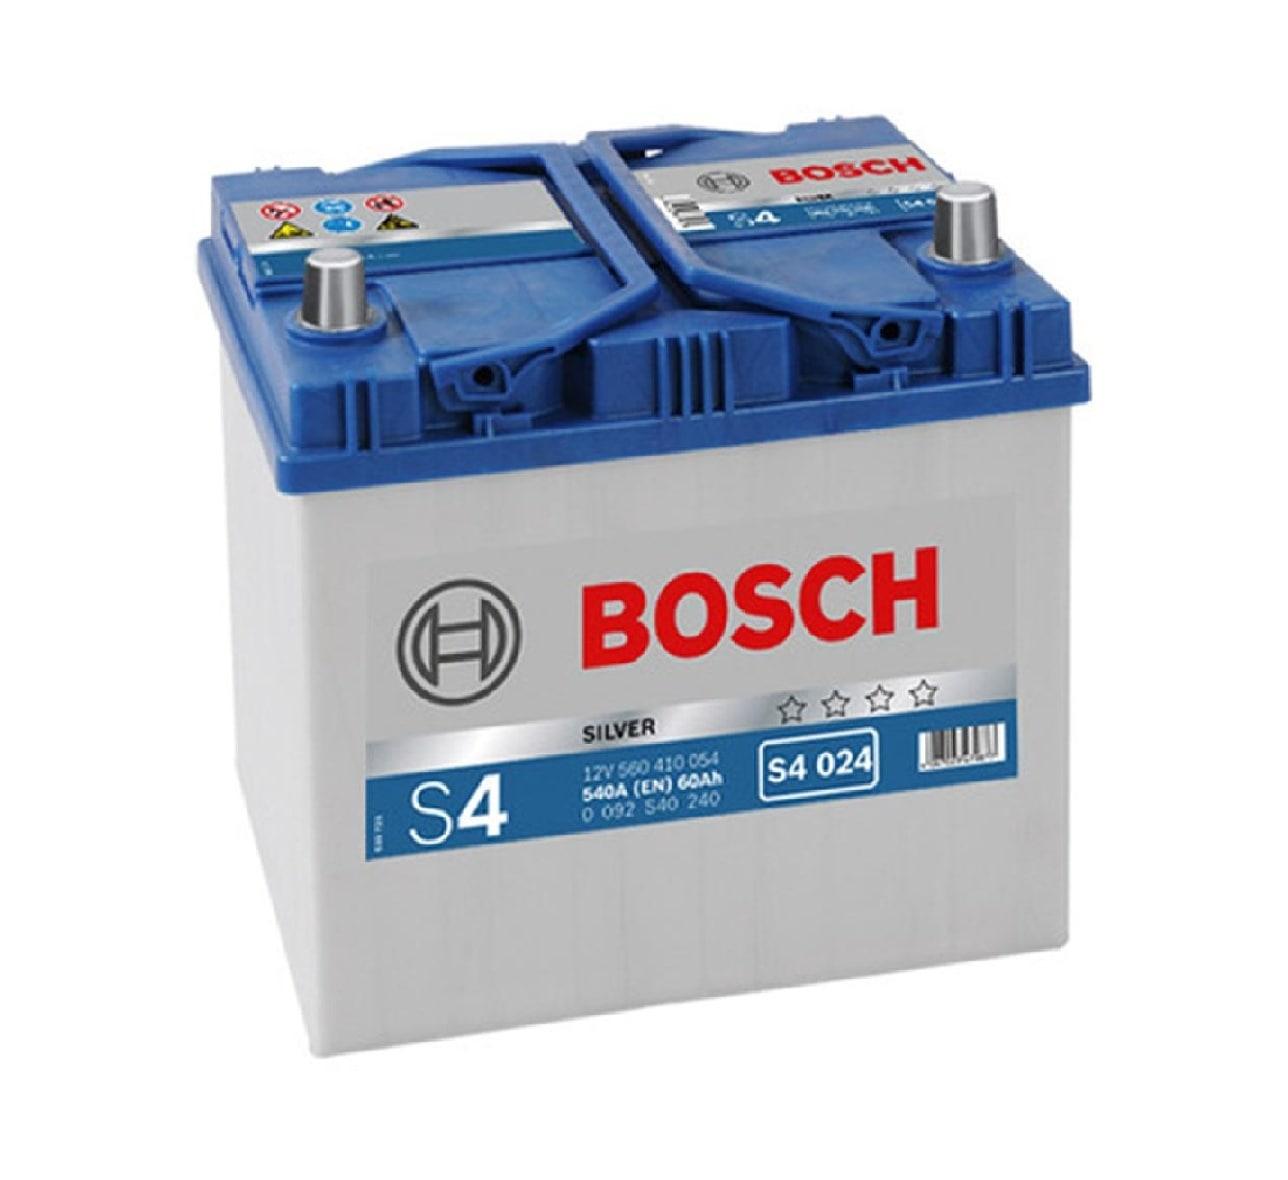 Купить Аккумулятор Bosch 60Ah S4 Silver (0) 540A Asia S4024